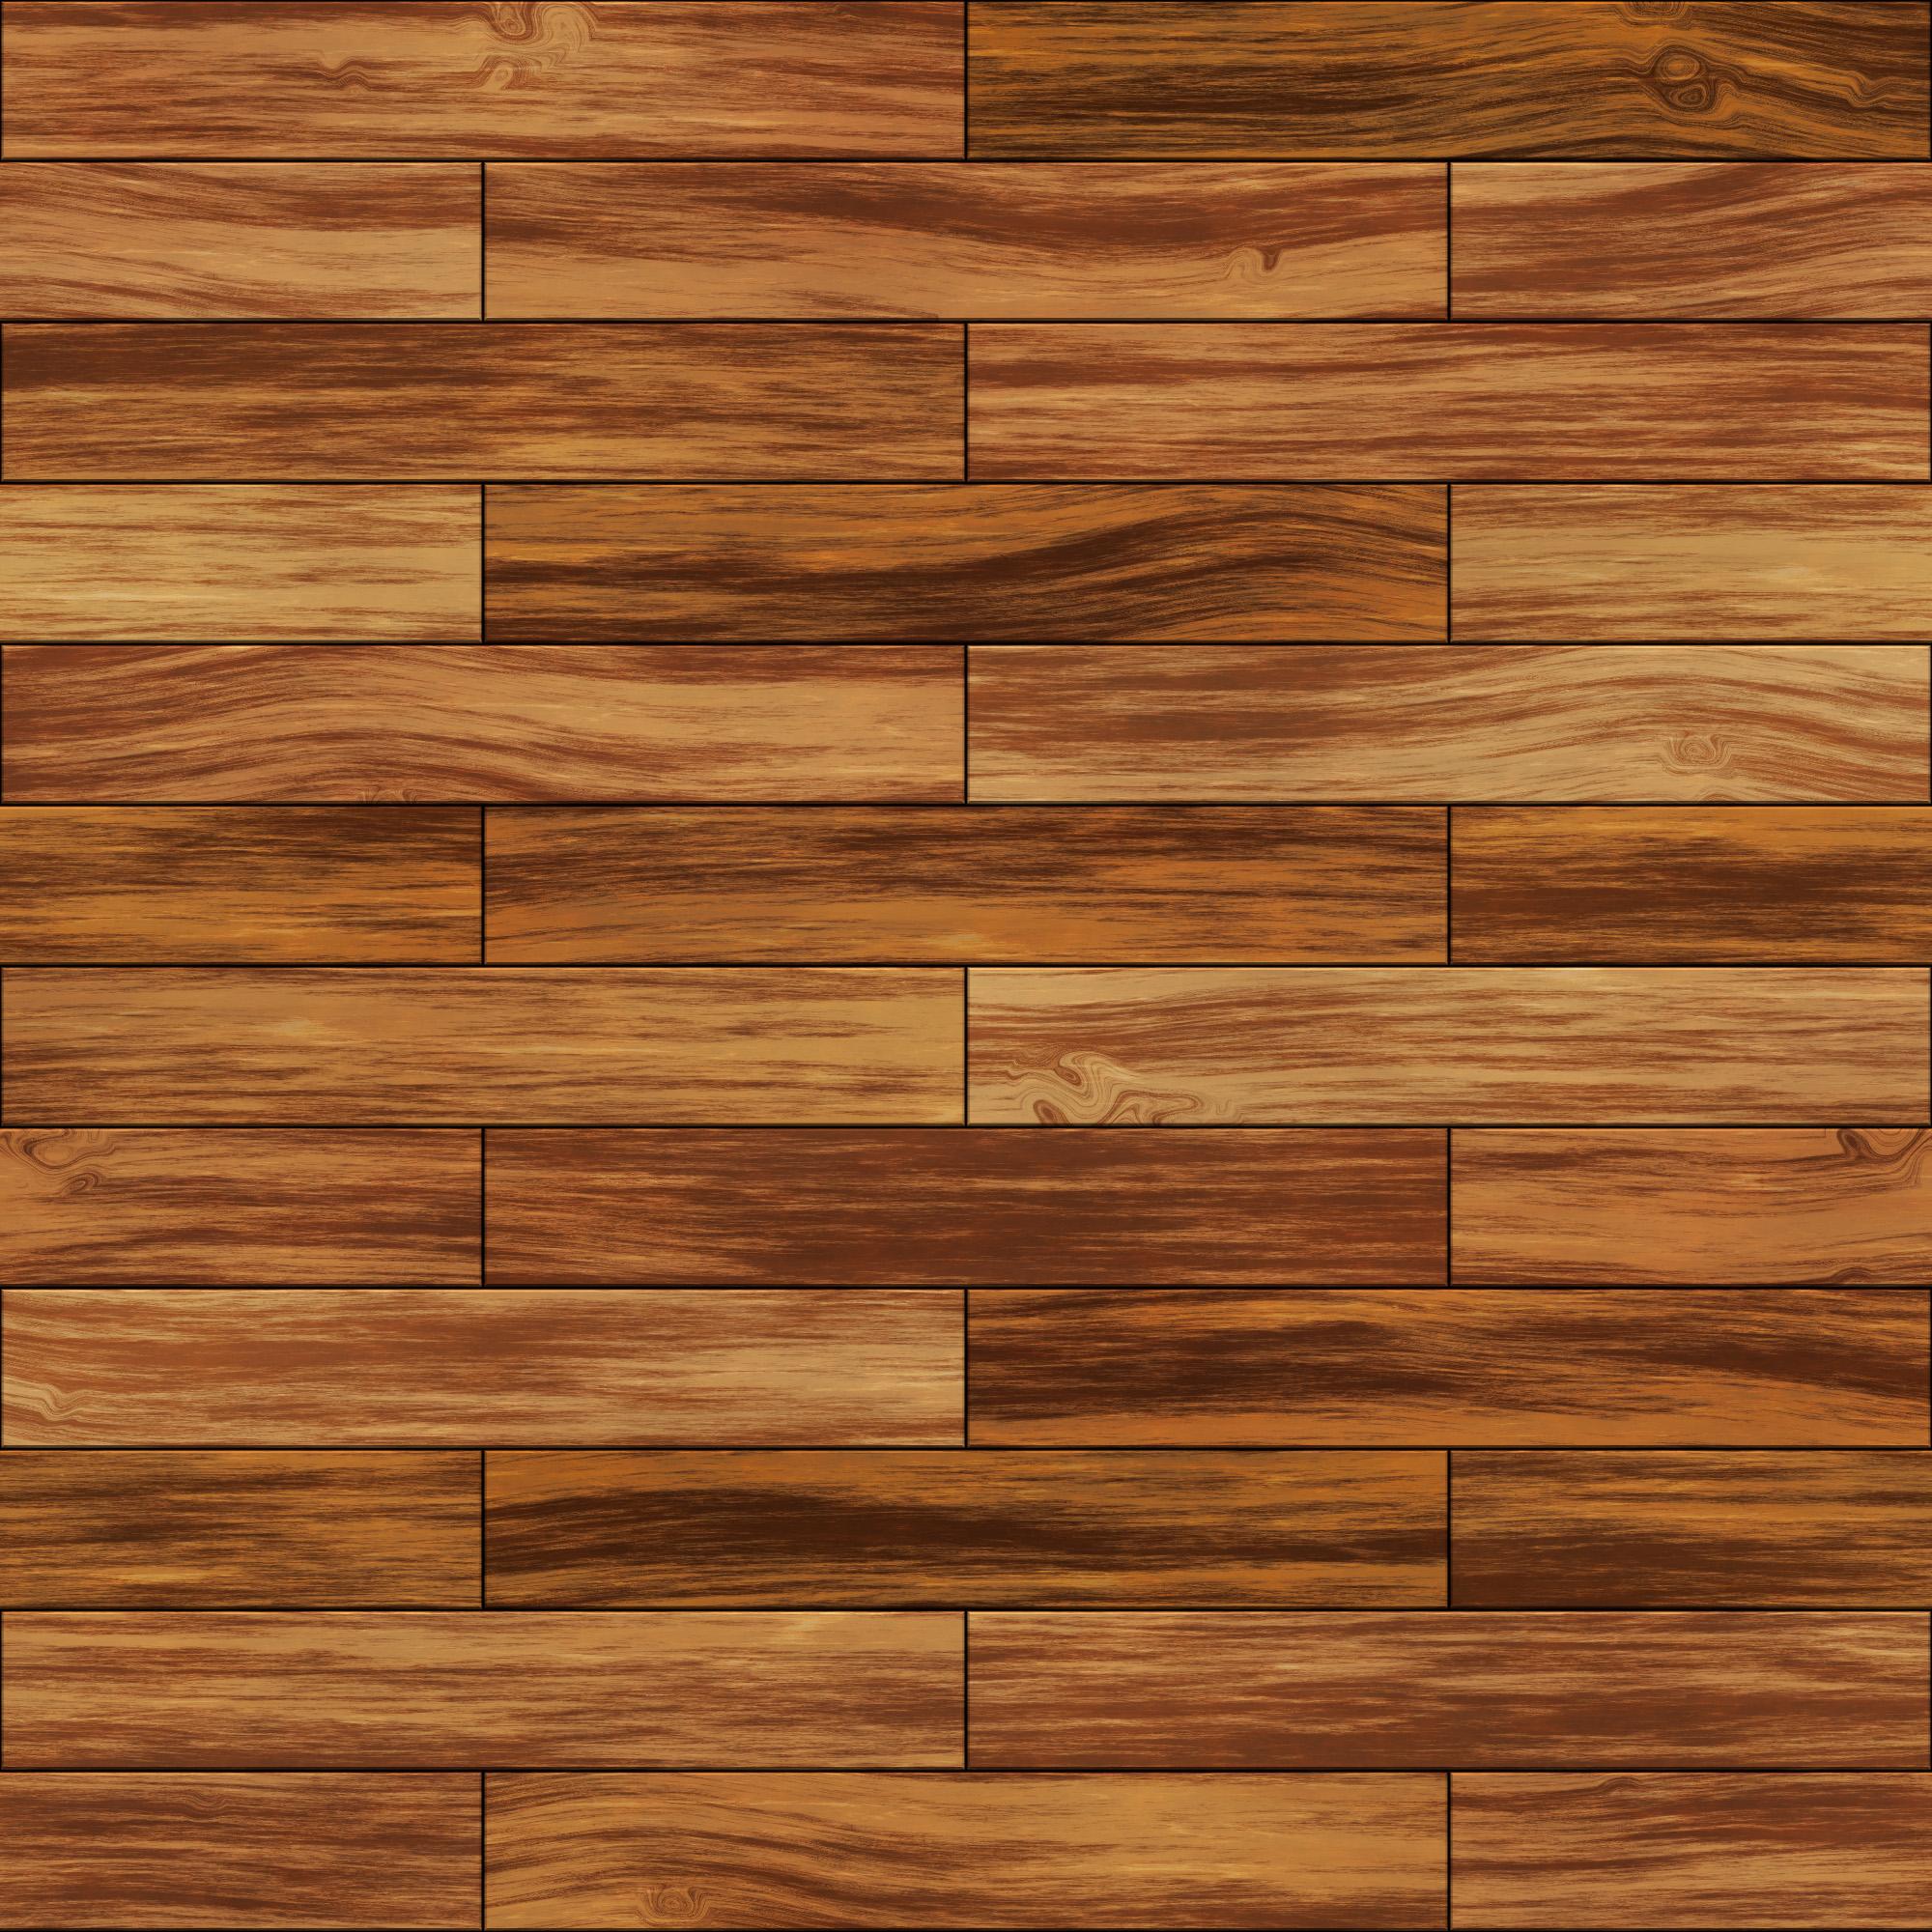 wood plank flooring seamless background wood planks 1 YJDMMFY